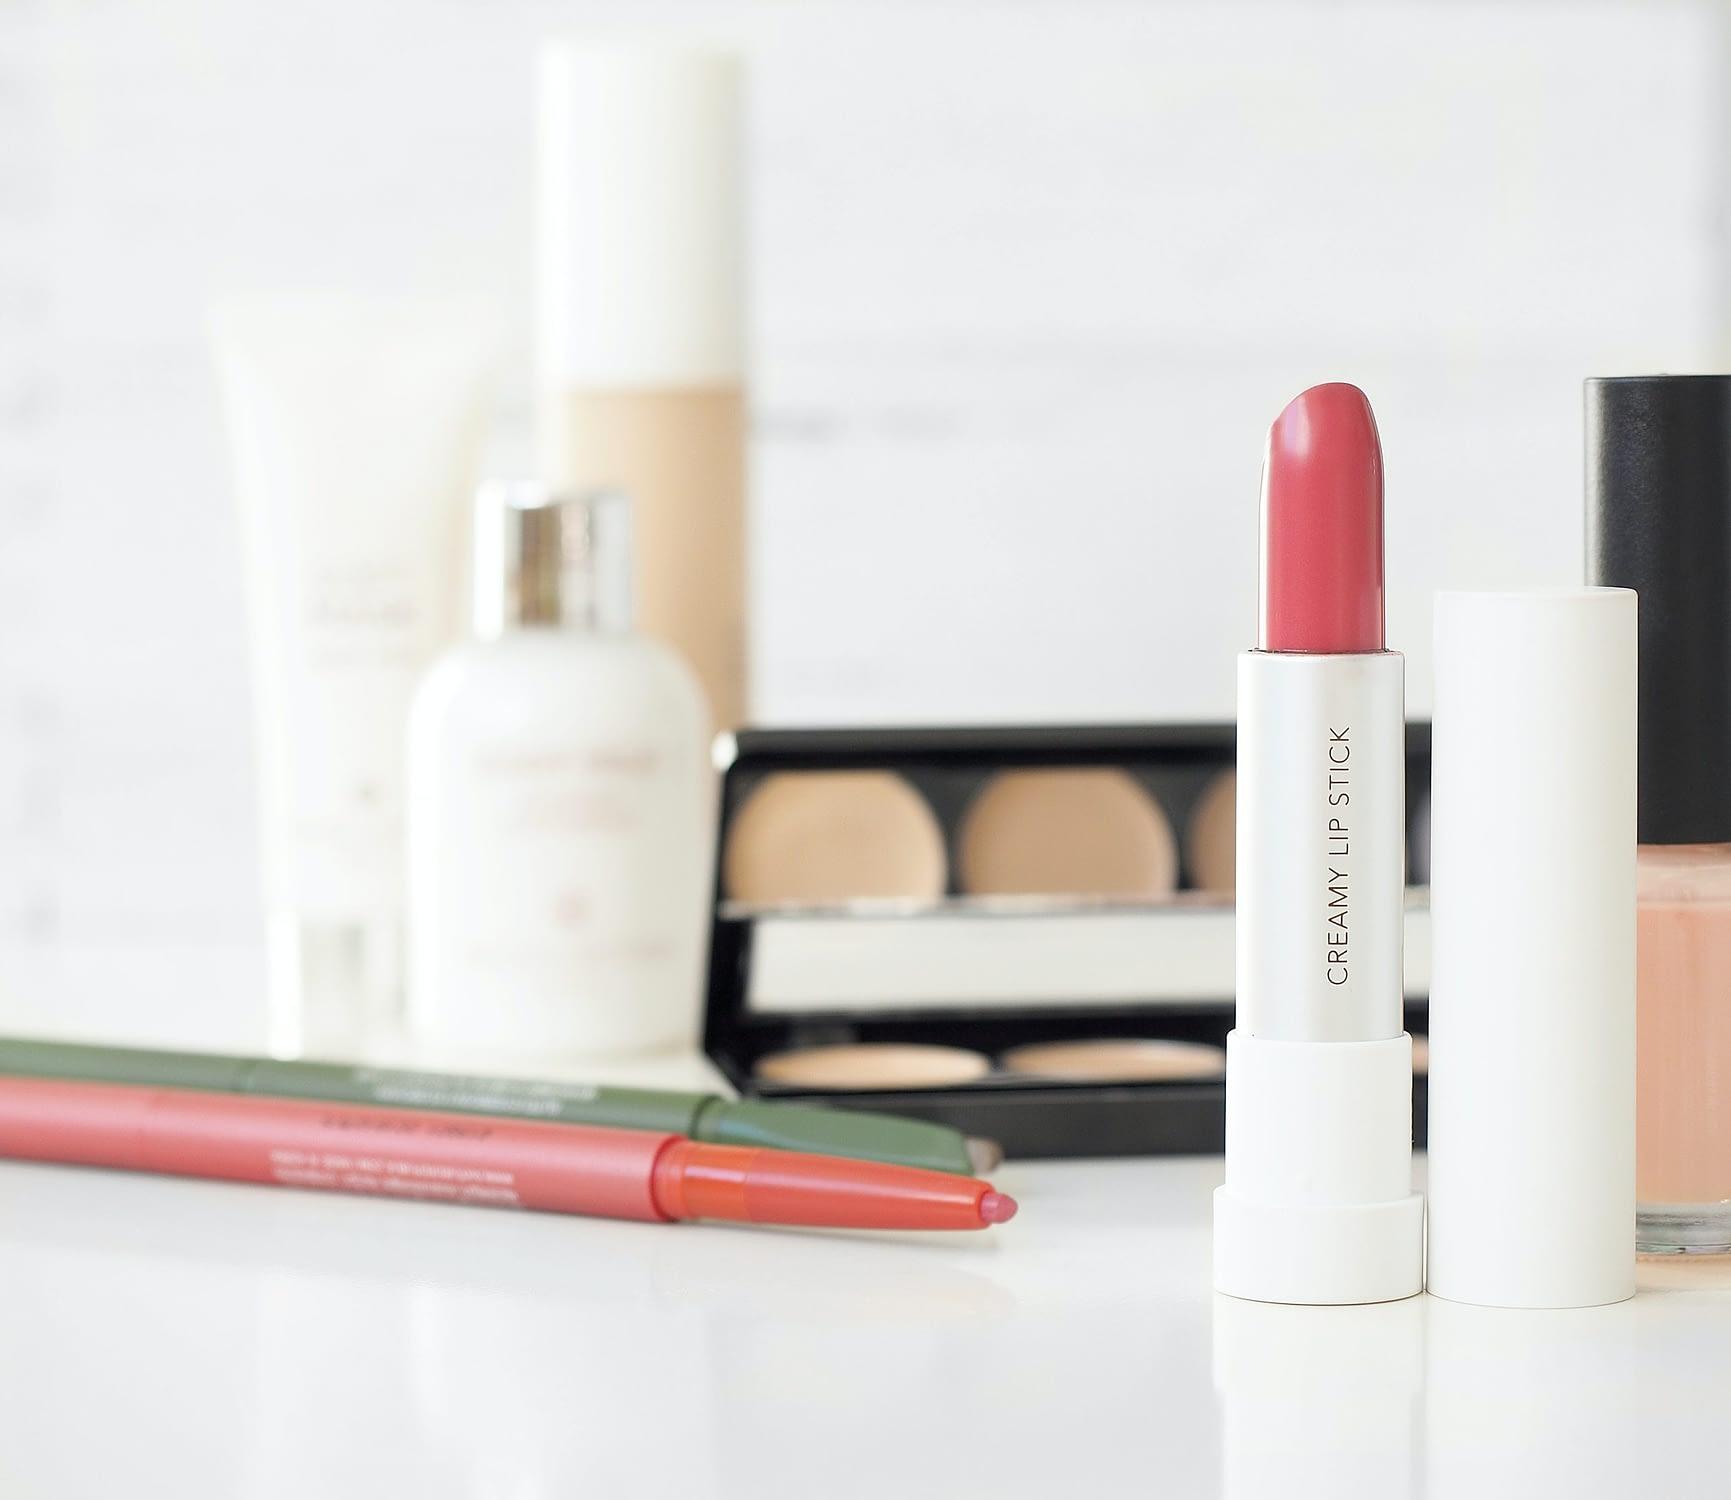 inside-m.fr/maquillage-et-coiffure